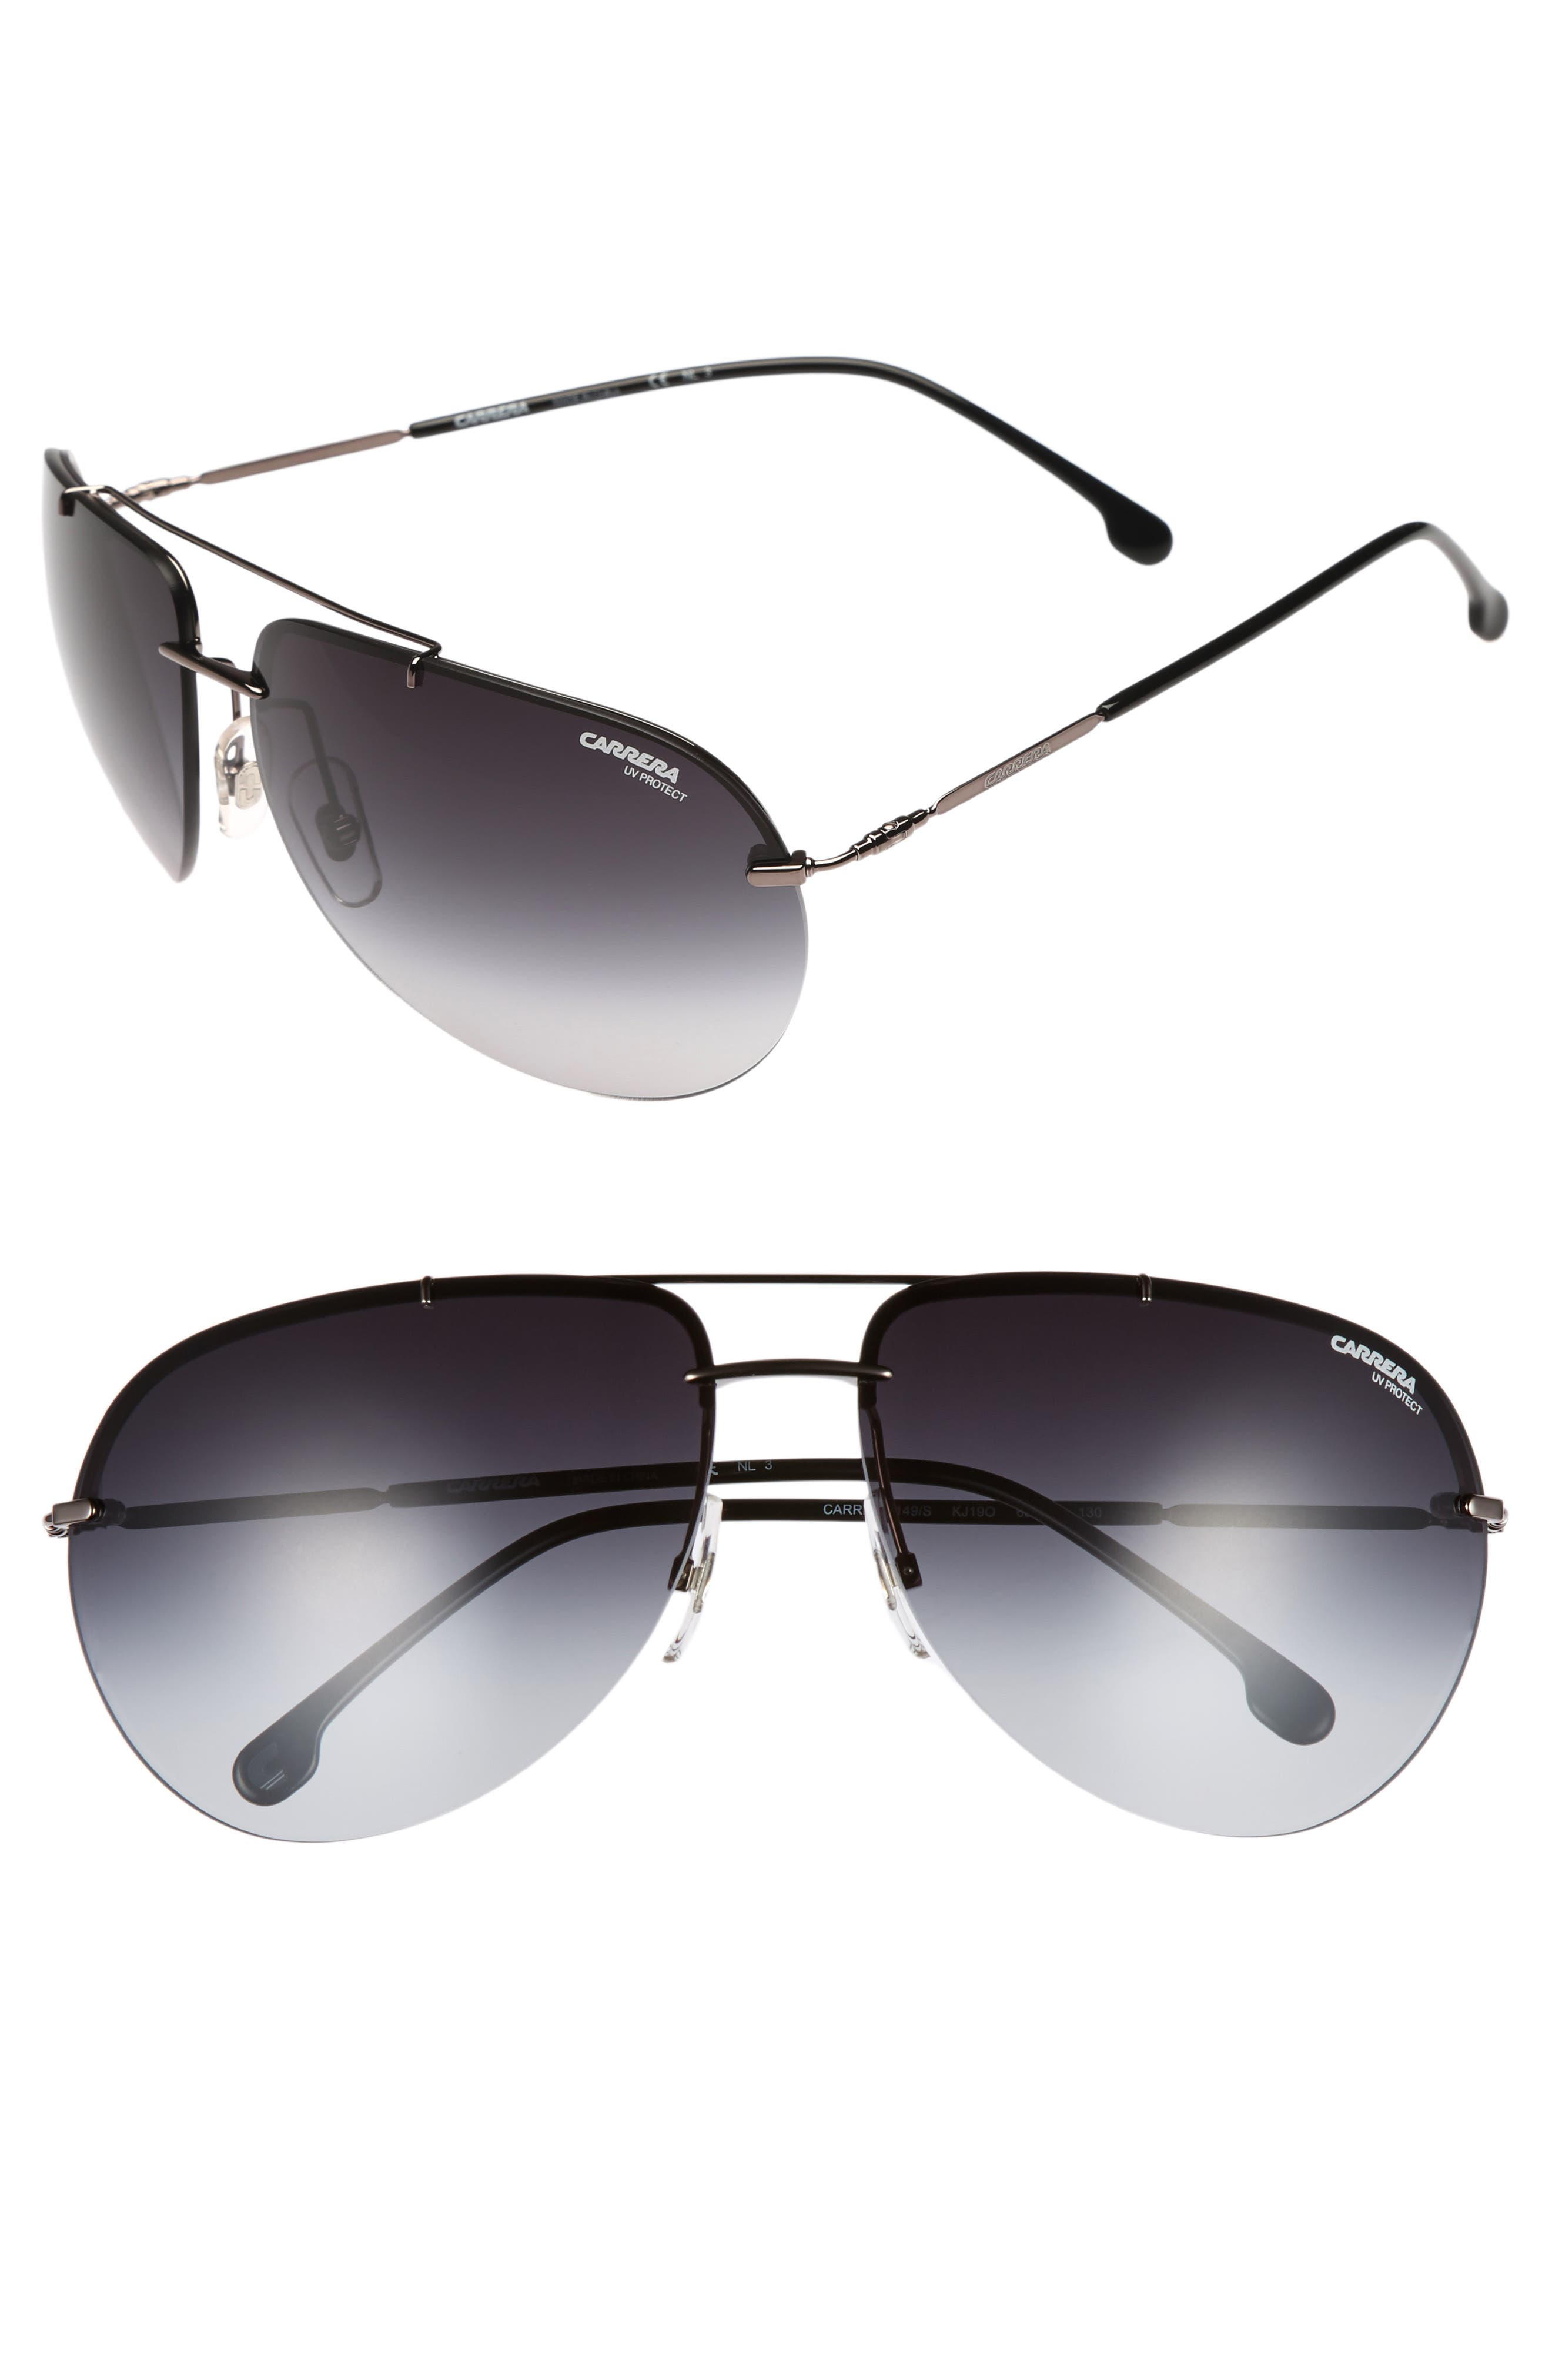 149S 65mm Polarized Aviator Sunglasses,                         Main,                         color, DARK RUTHENIUM / GRAY GRADIENT